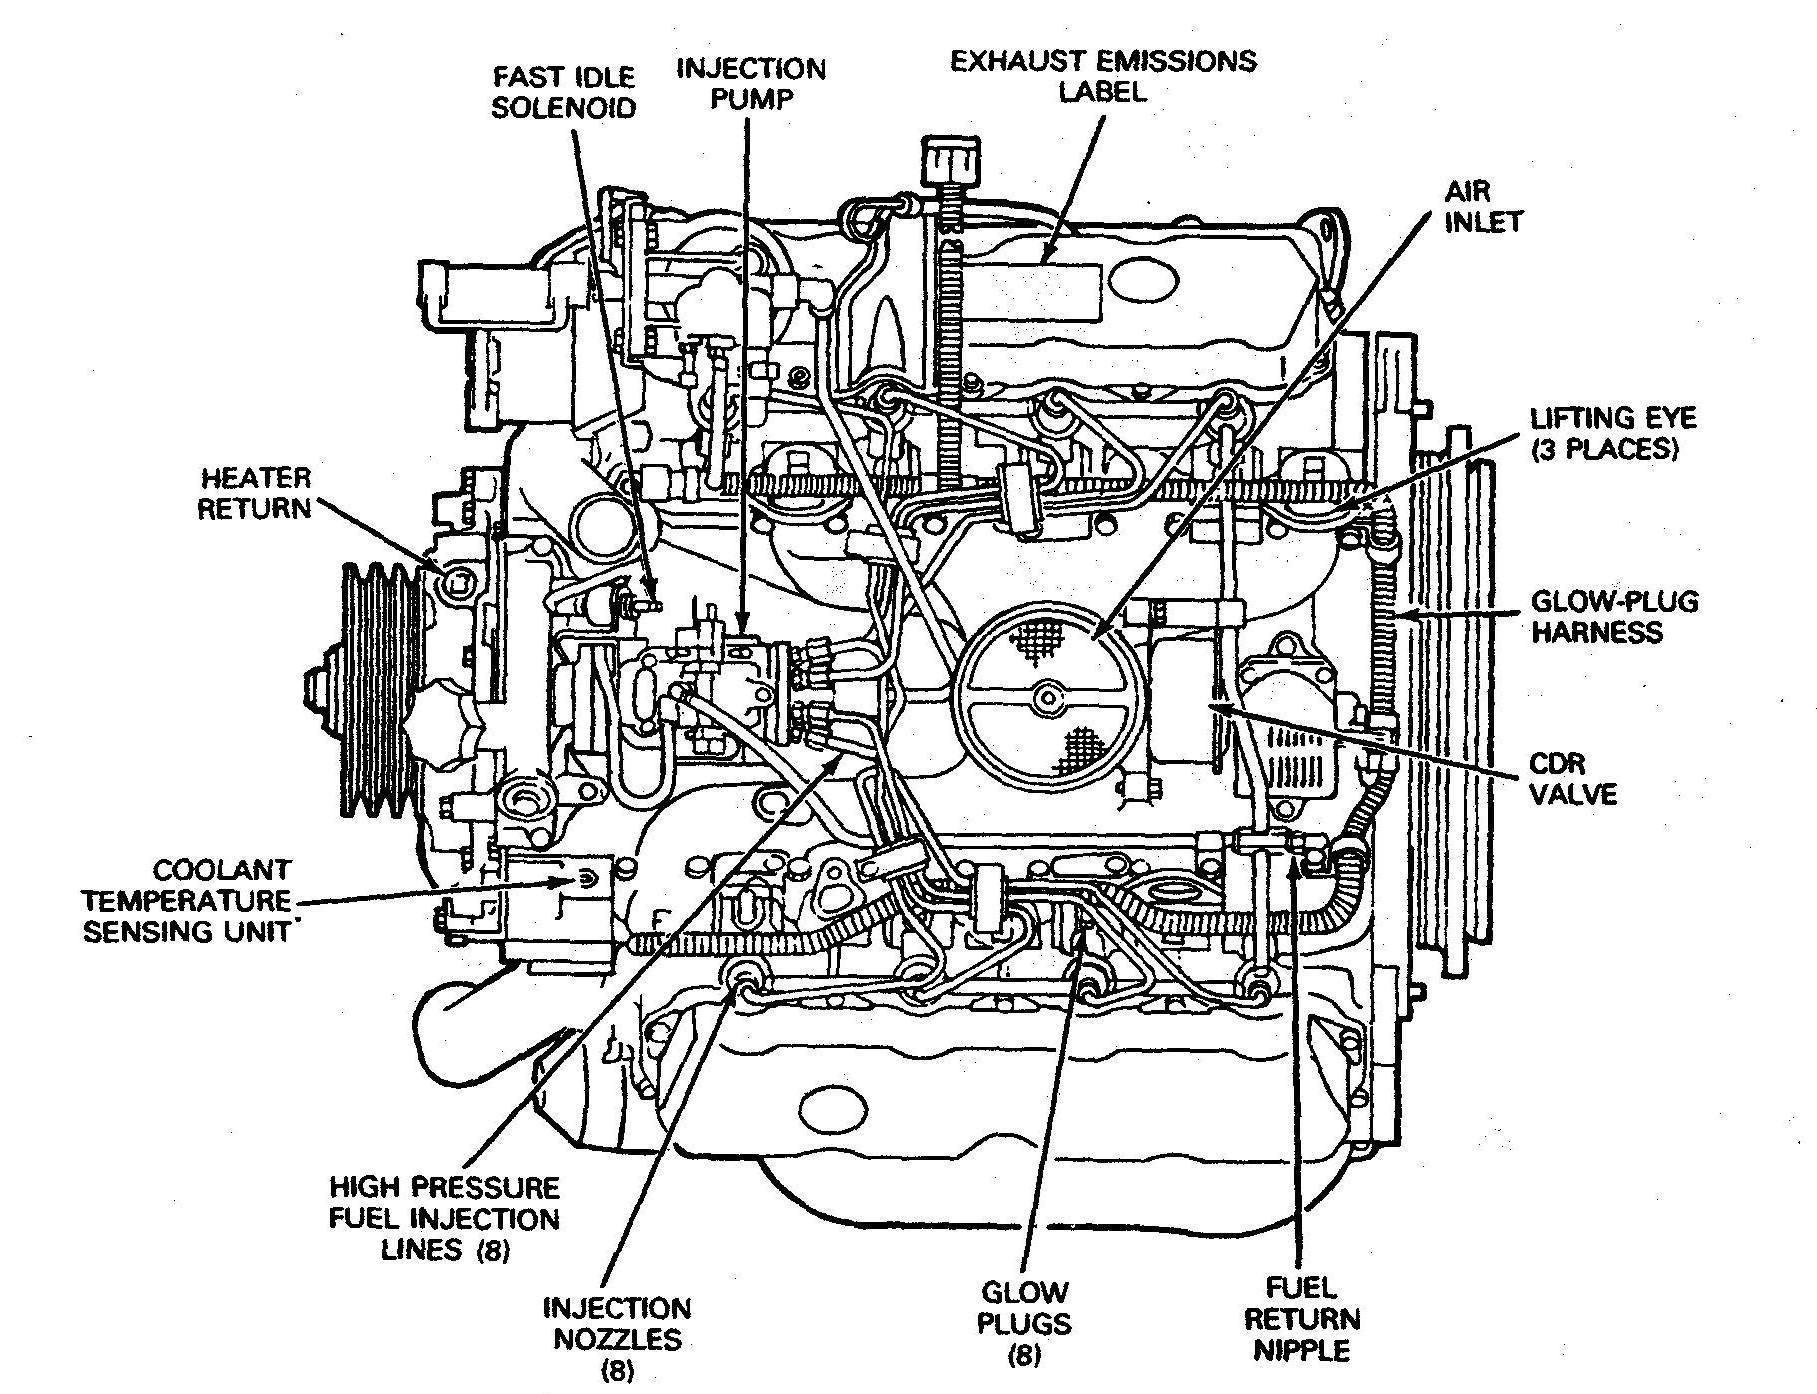 Car Engine Parts with Diagram 20fresh Bmw Engine Diagram Of Car Engine Parts with Diagram